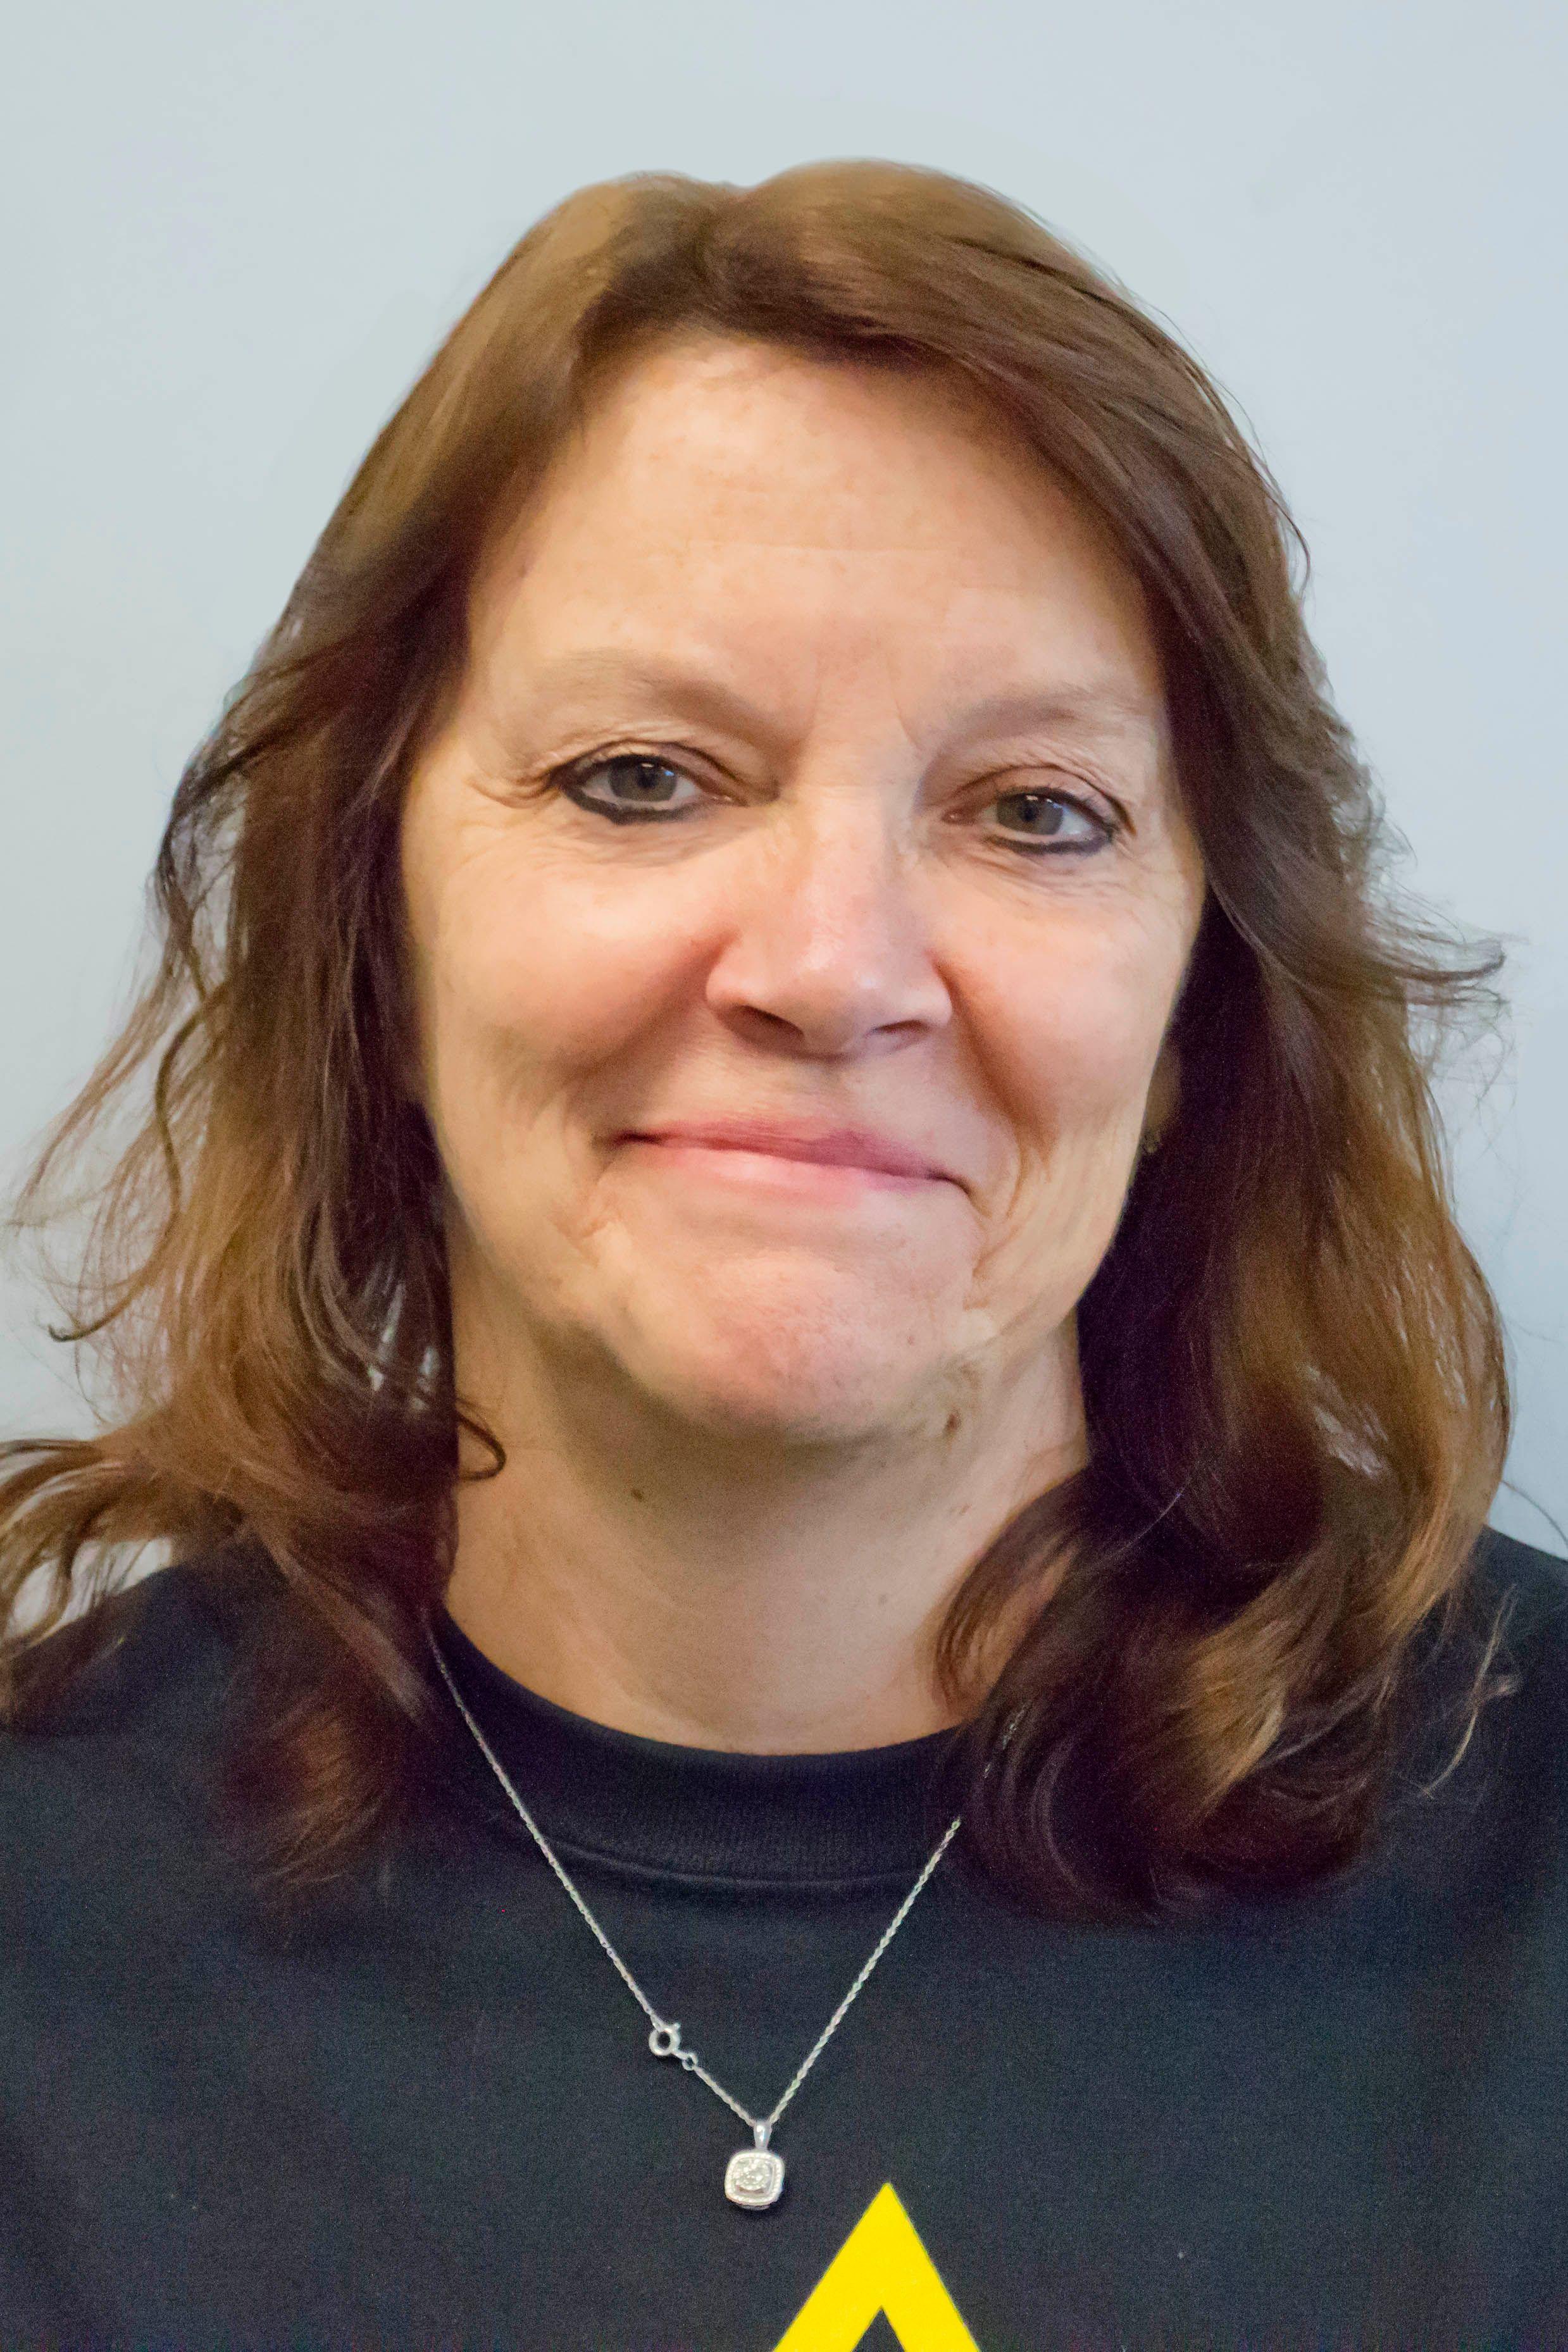 Valerie Camic